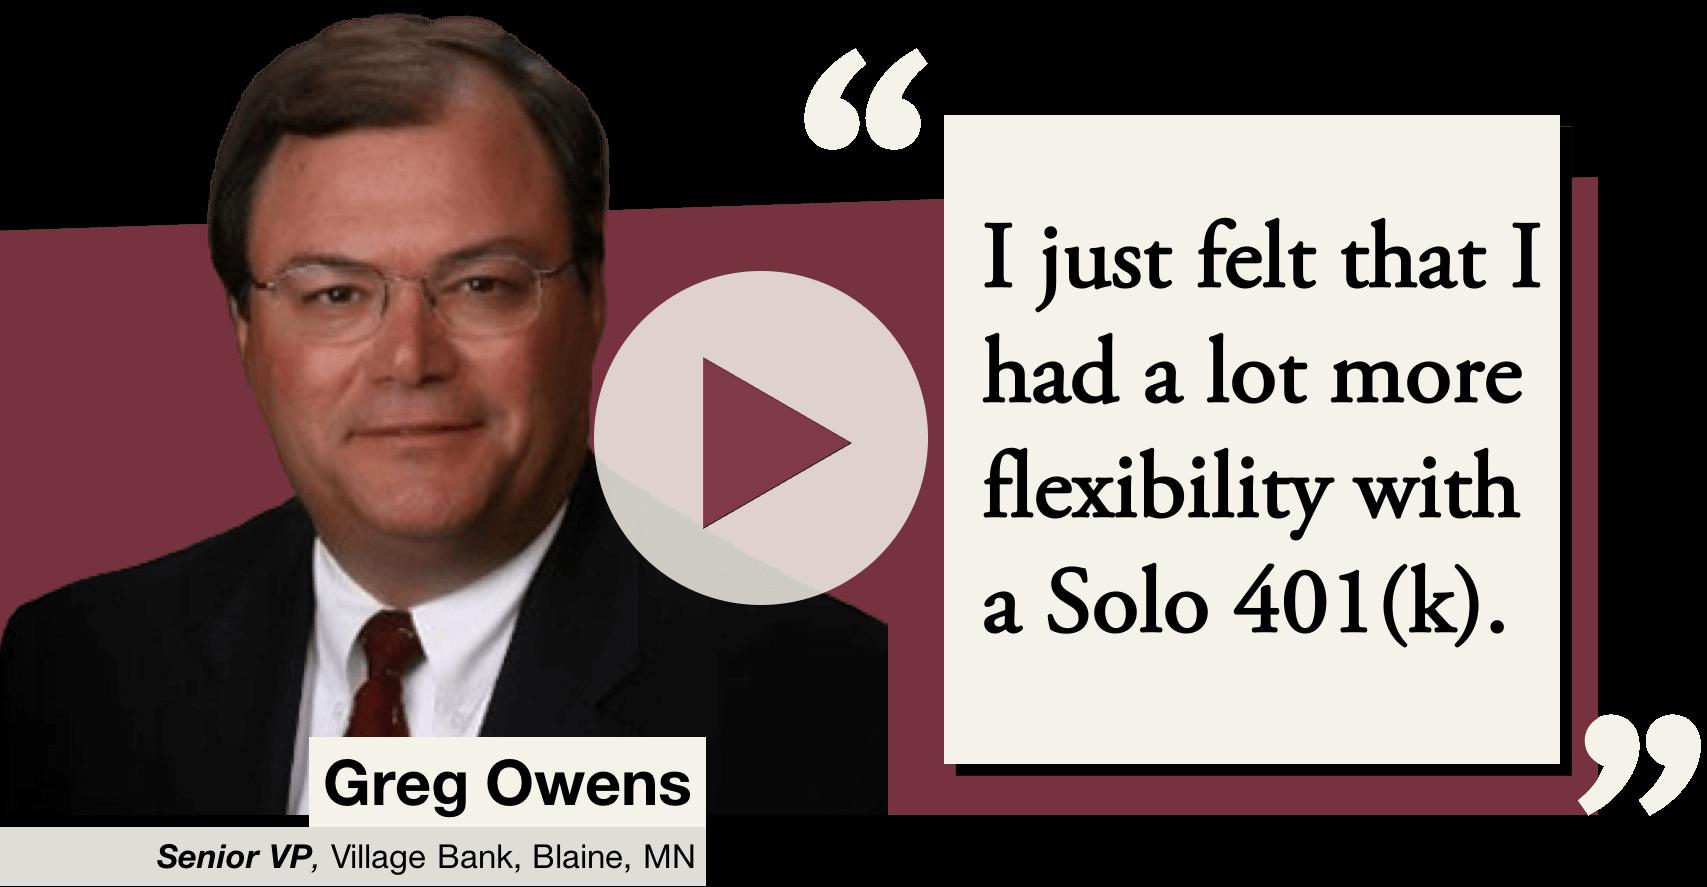 Greg Owens Flexibility Website